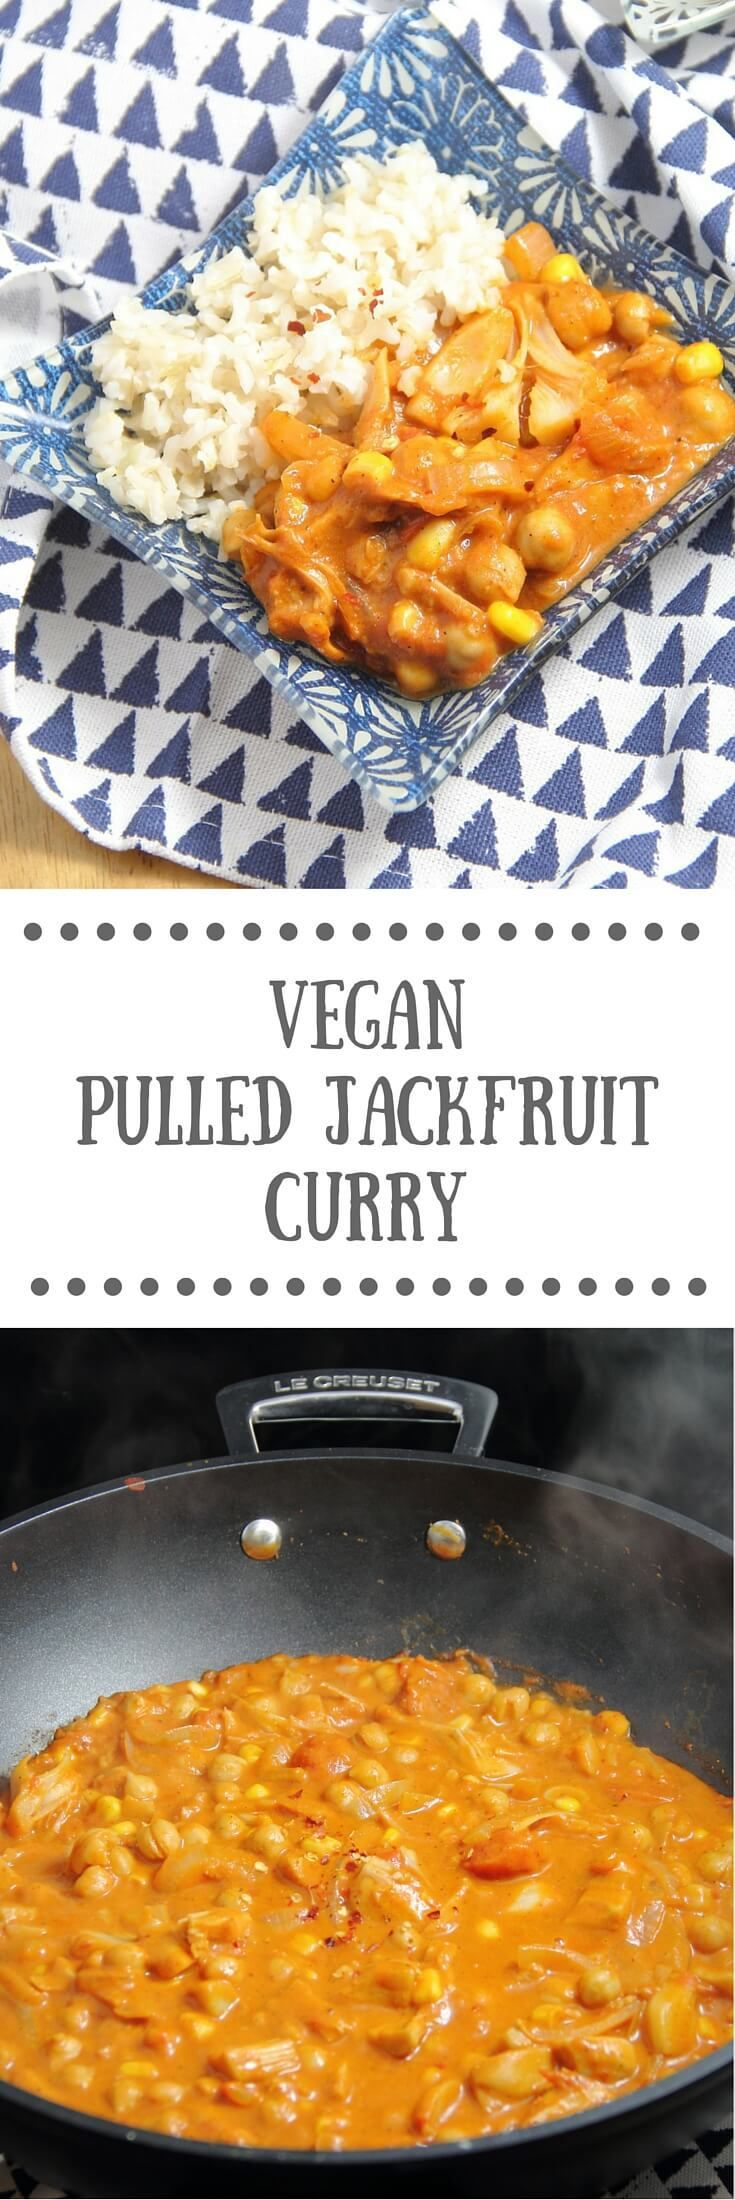 Pulled Jackfruit Curry - Vegan Recipe